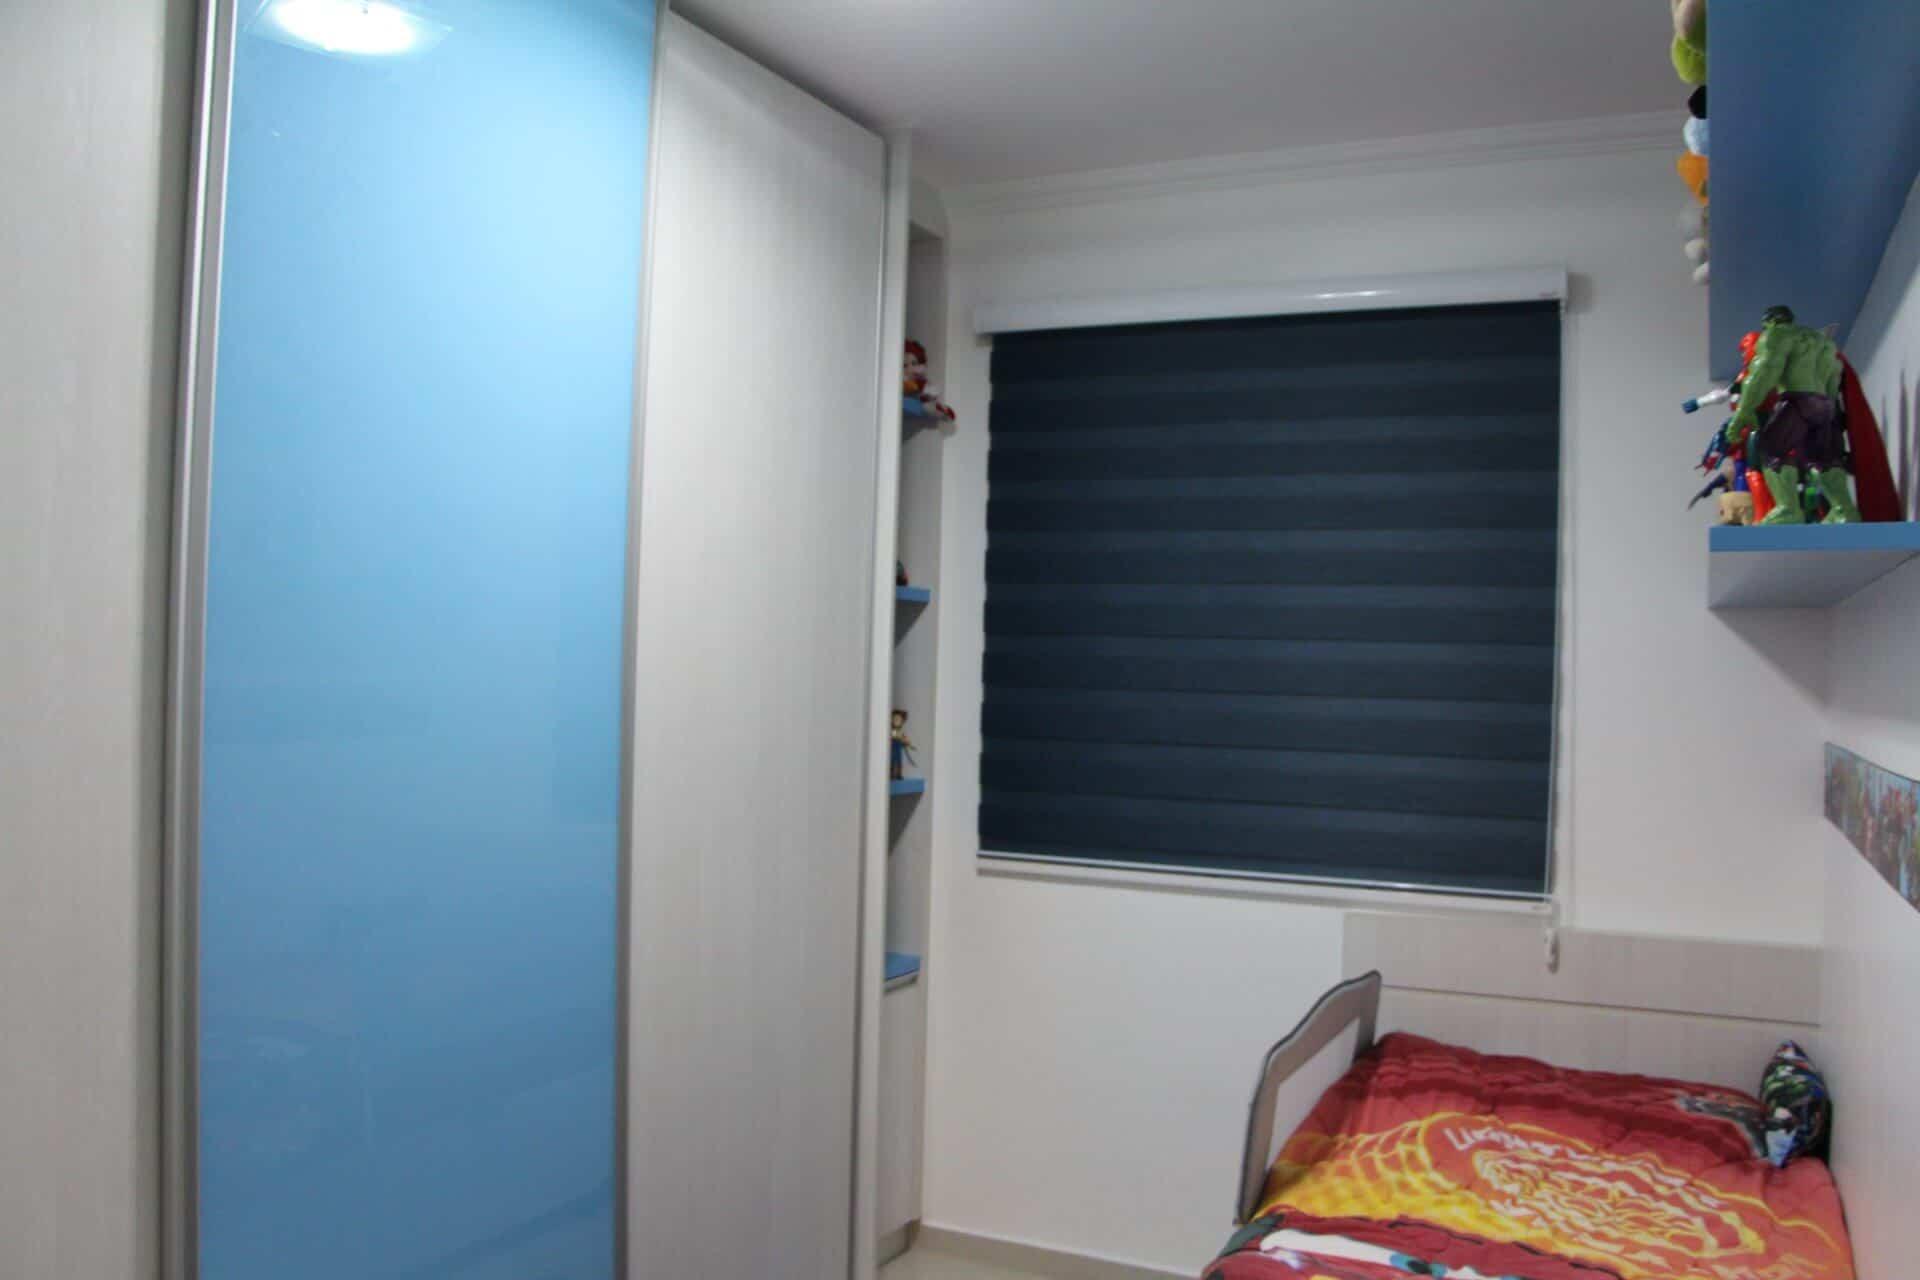 dormitorio-planejado_moveis-sob-medida-galeria-67